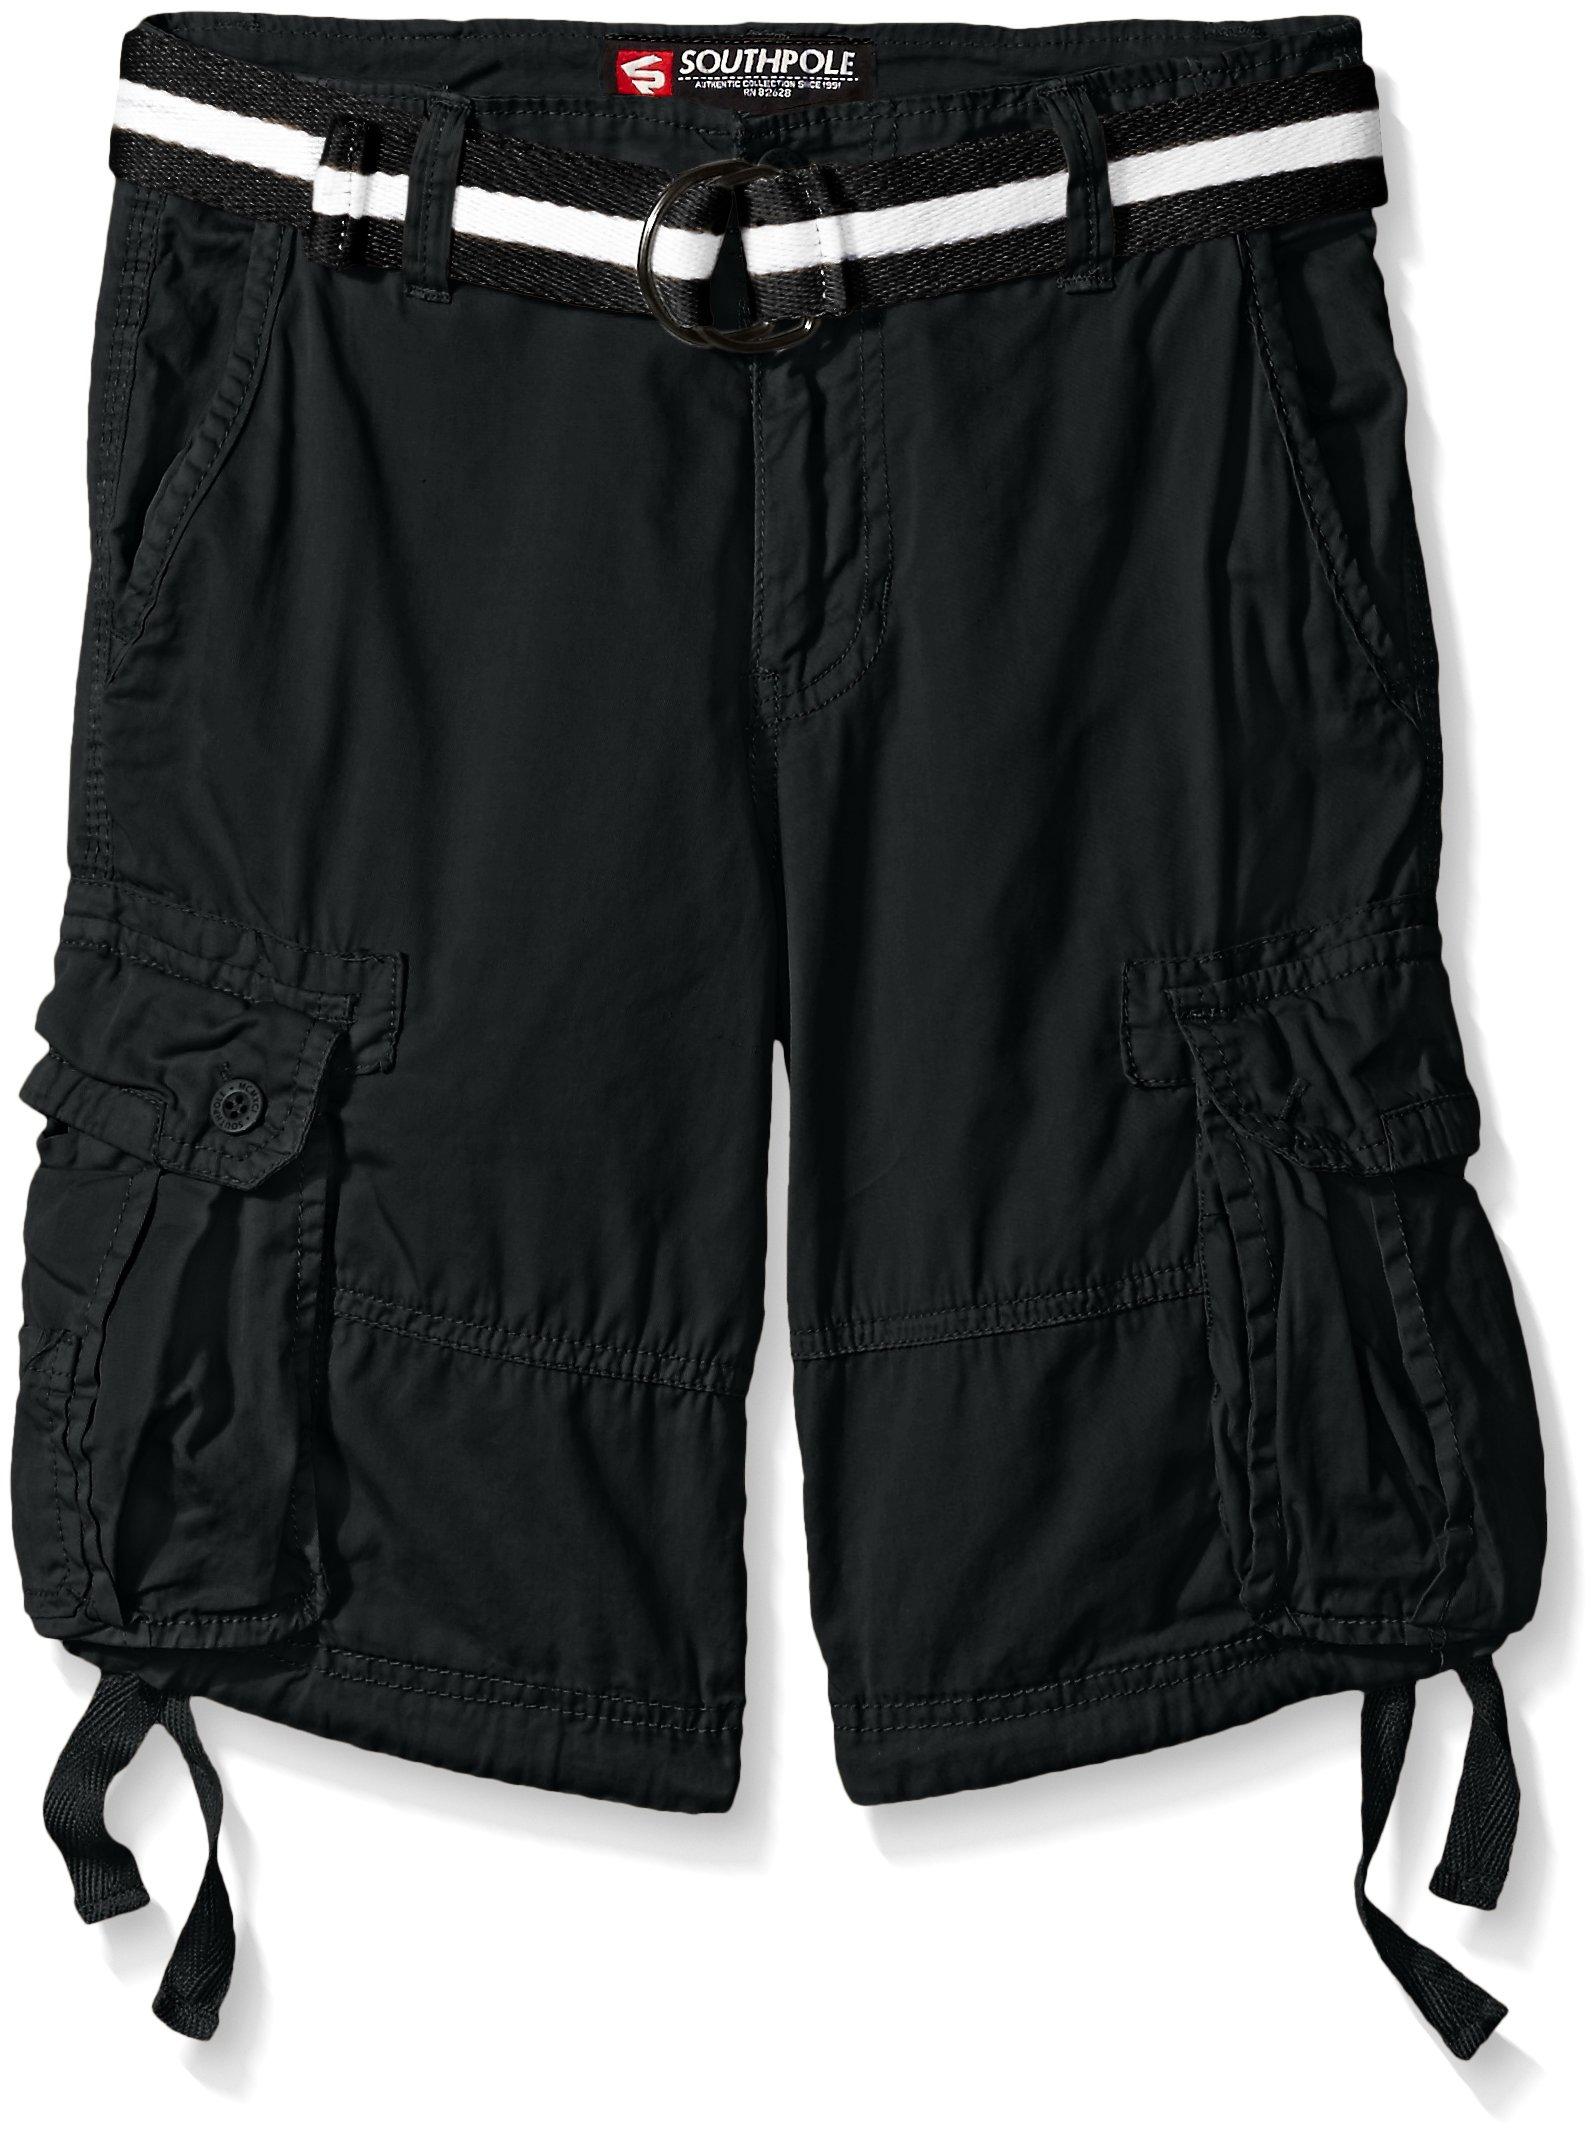 Southpole Big Boys Belted Fine Twill Basic Cargo Short, Black, 12